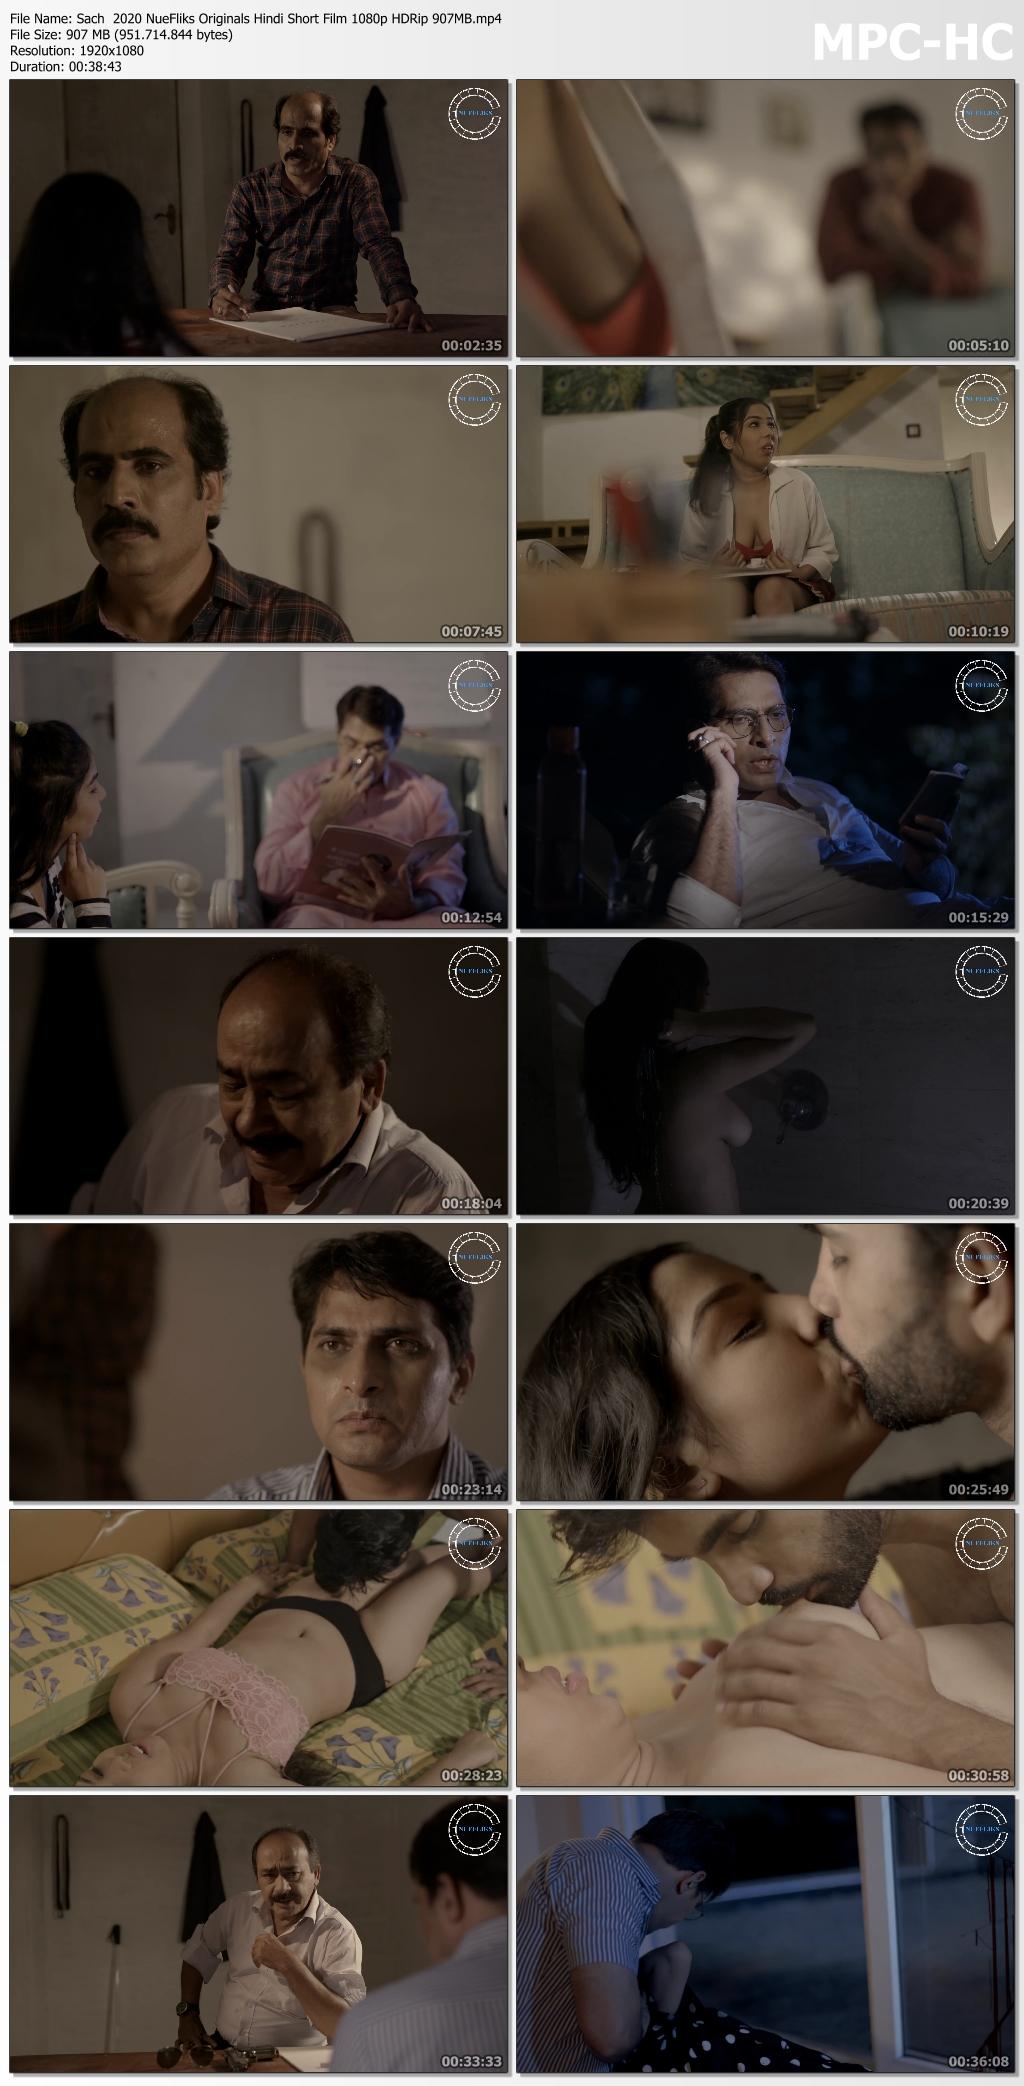 Sach-2020-Nue-Fliks-Originals-Hindi-Short-Film-1080p-HDRip-907-MB-mp4-thumbs